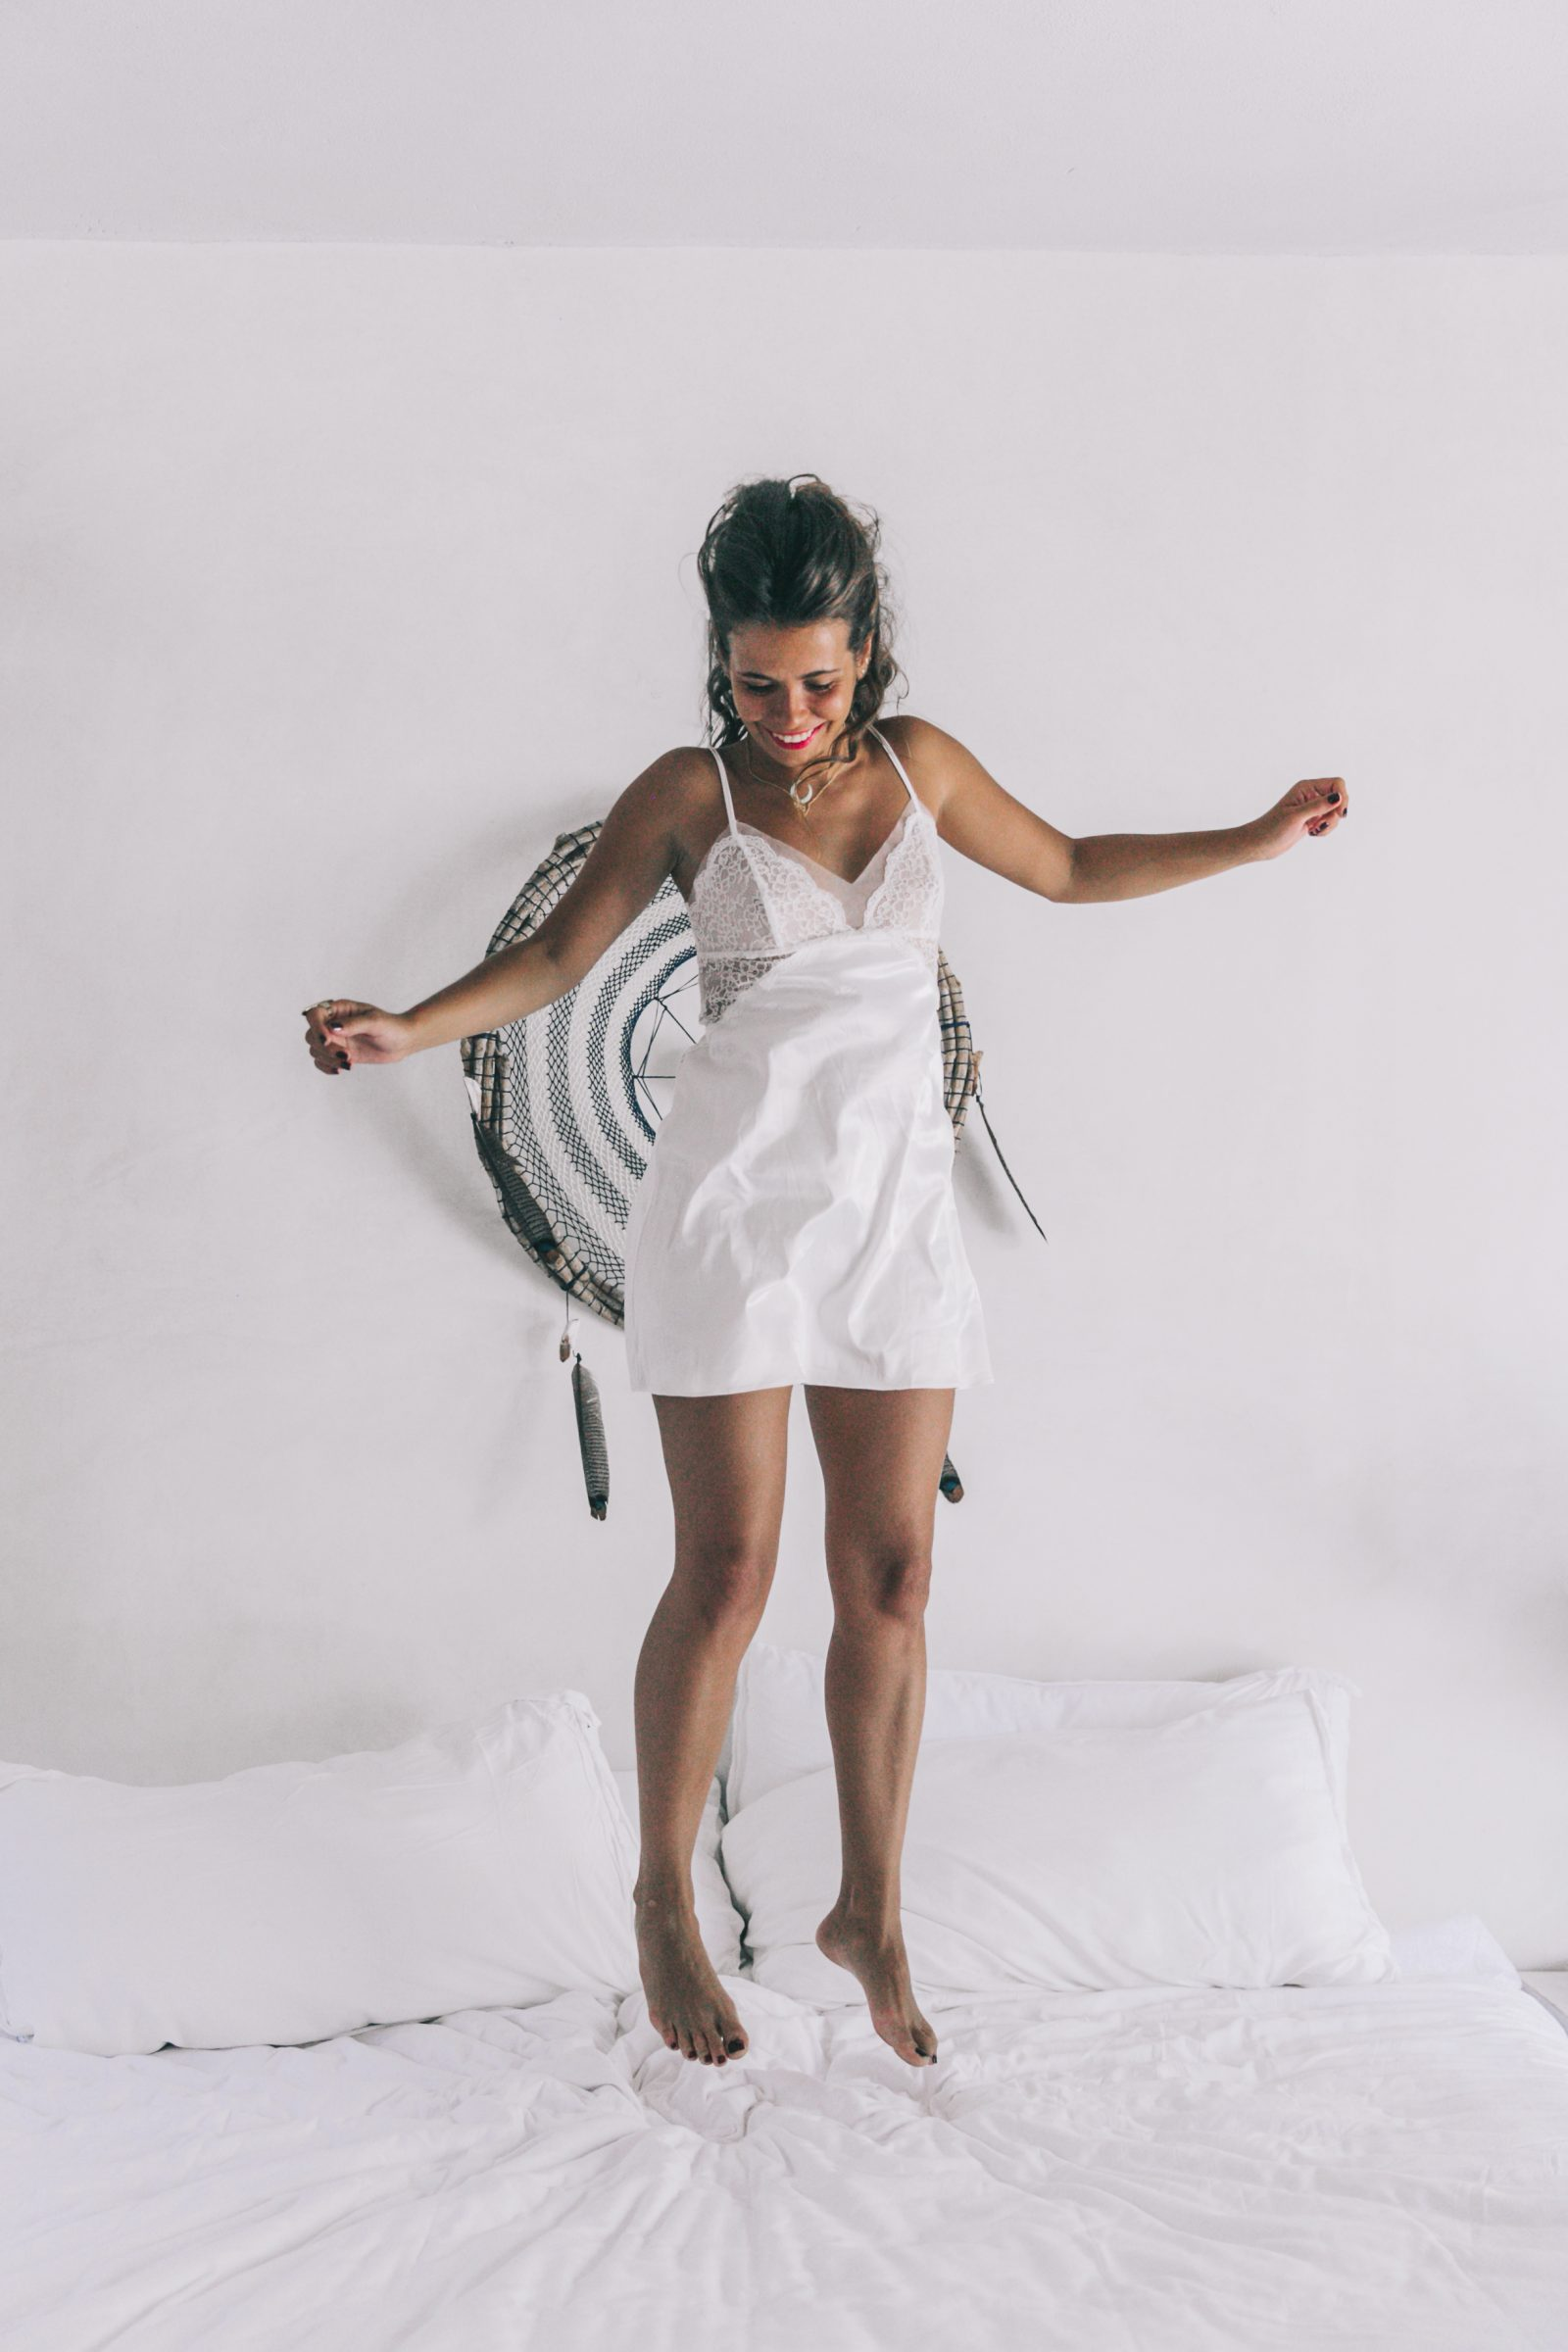 slip_dress-sanara_tulum-beach-mexico-outfit-collage_vintage-40